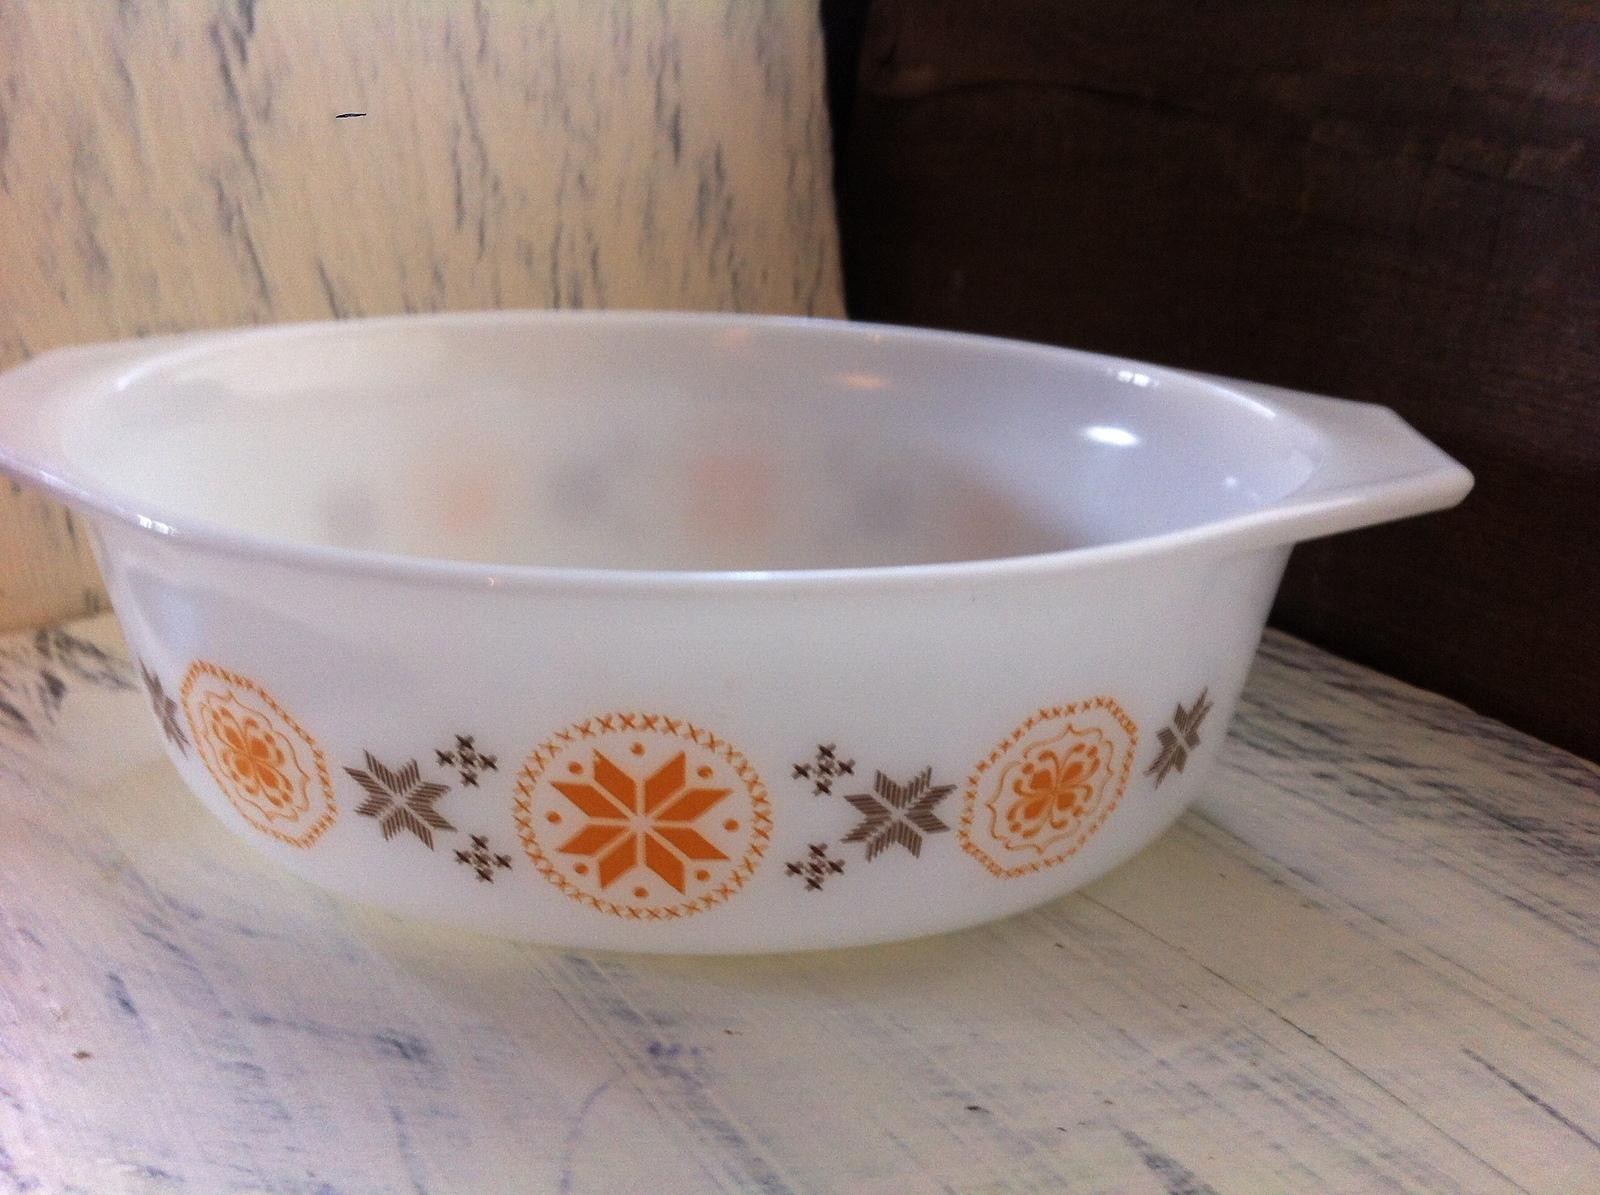 Vintage Pyrex Town & Country Brown/Orange Casserole Dish No. 043 1 1/2 qt.~ USA image 2